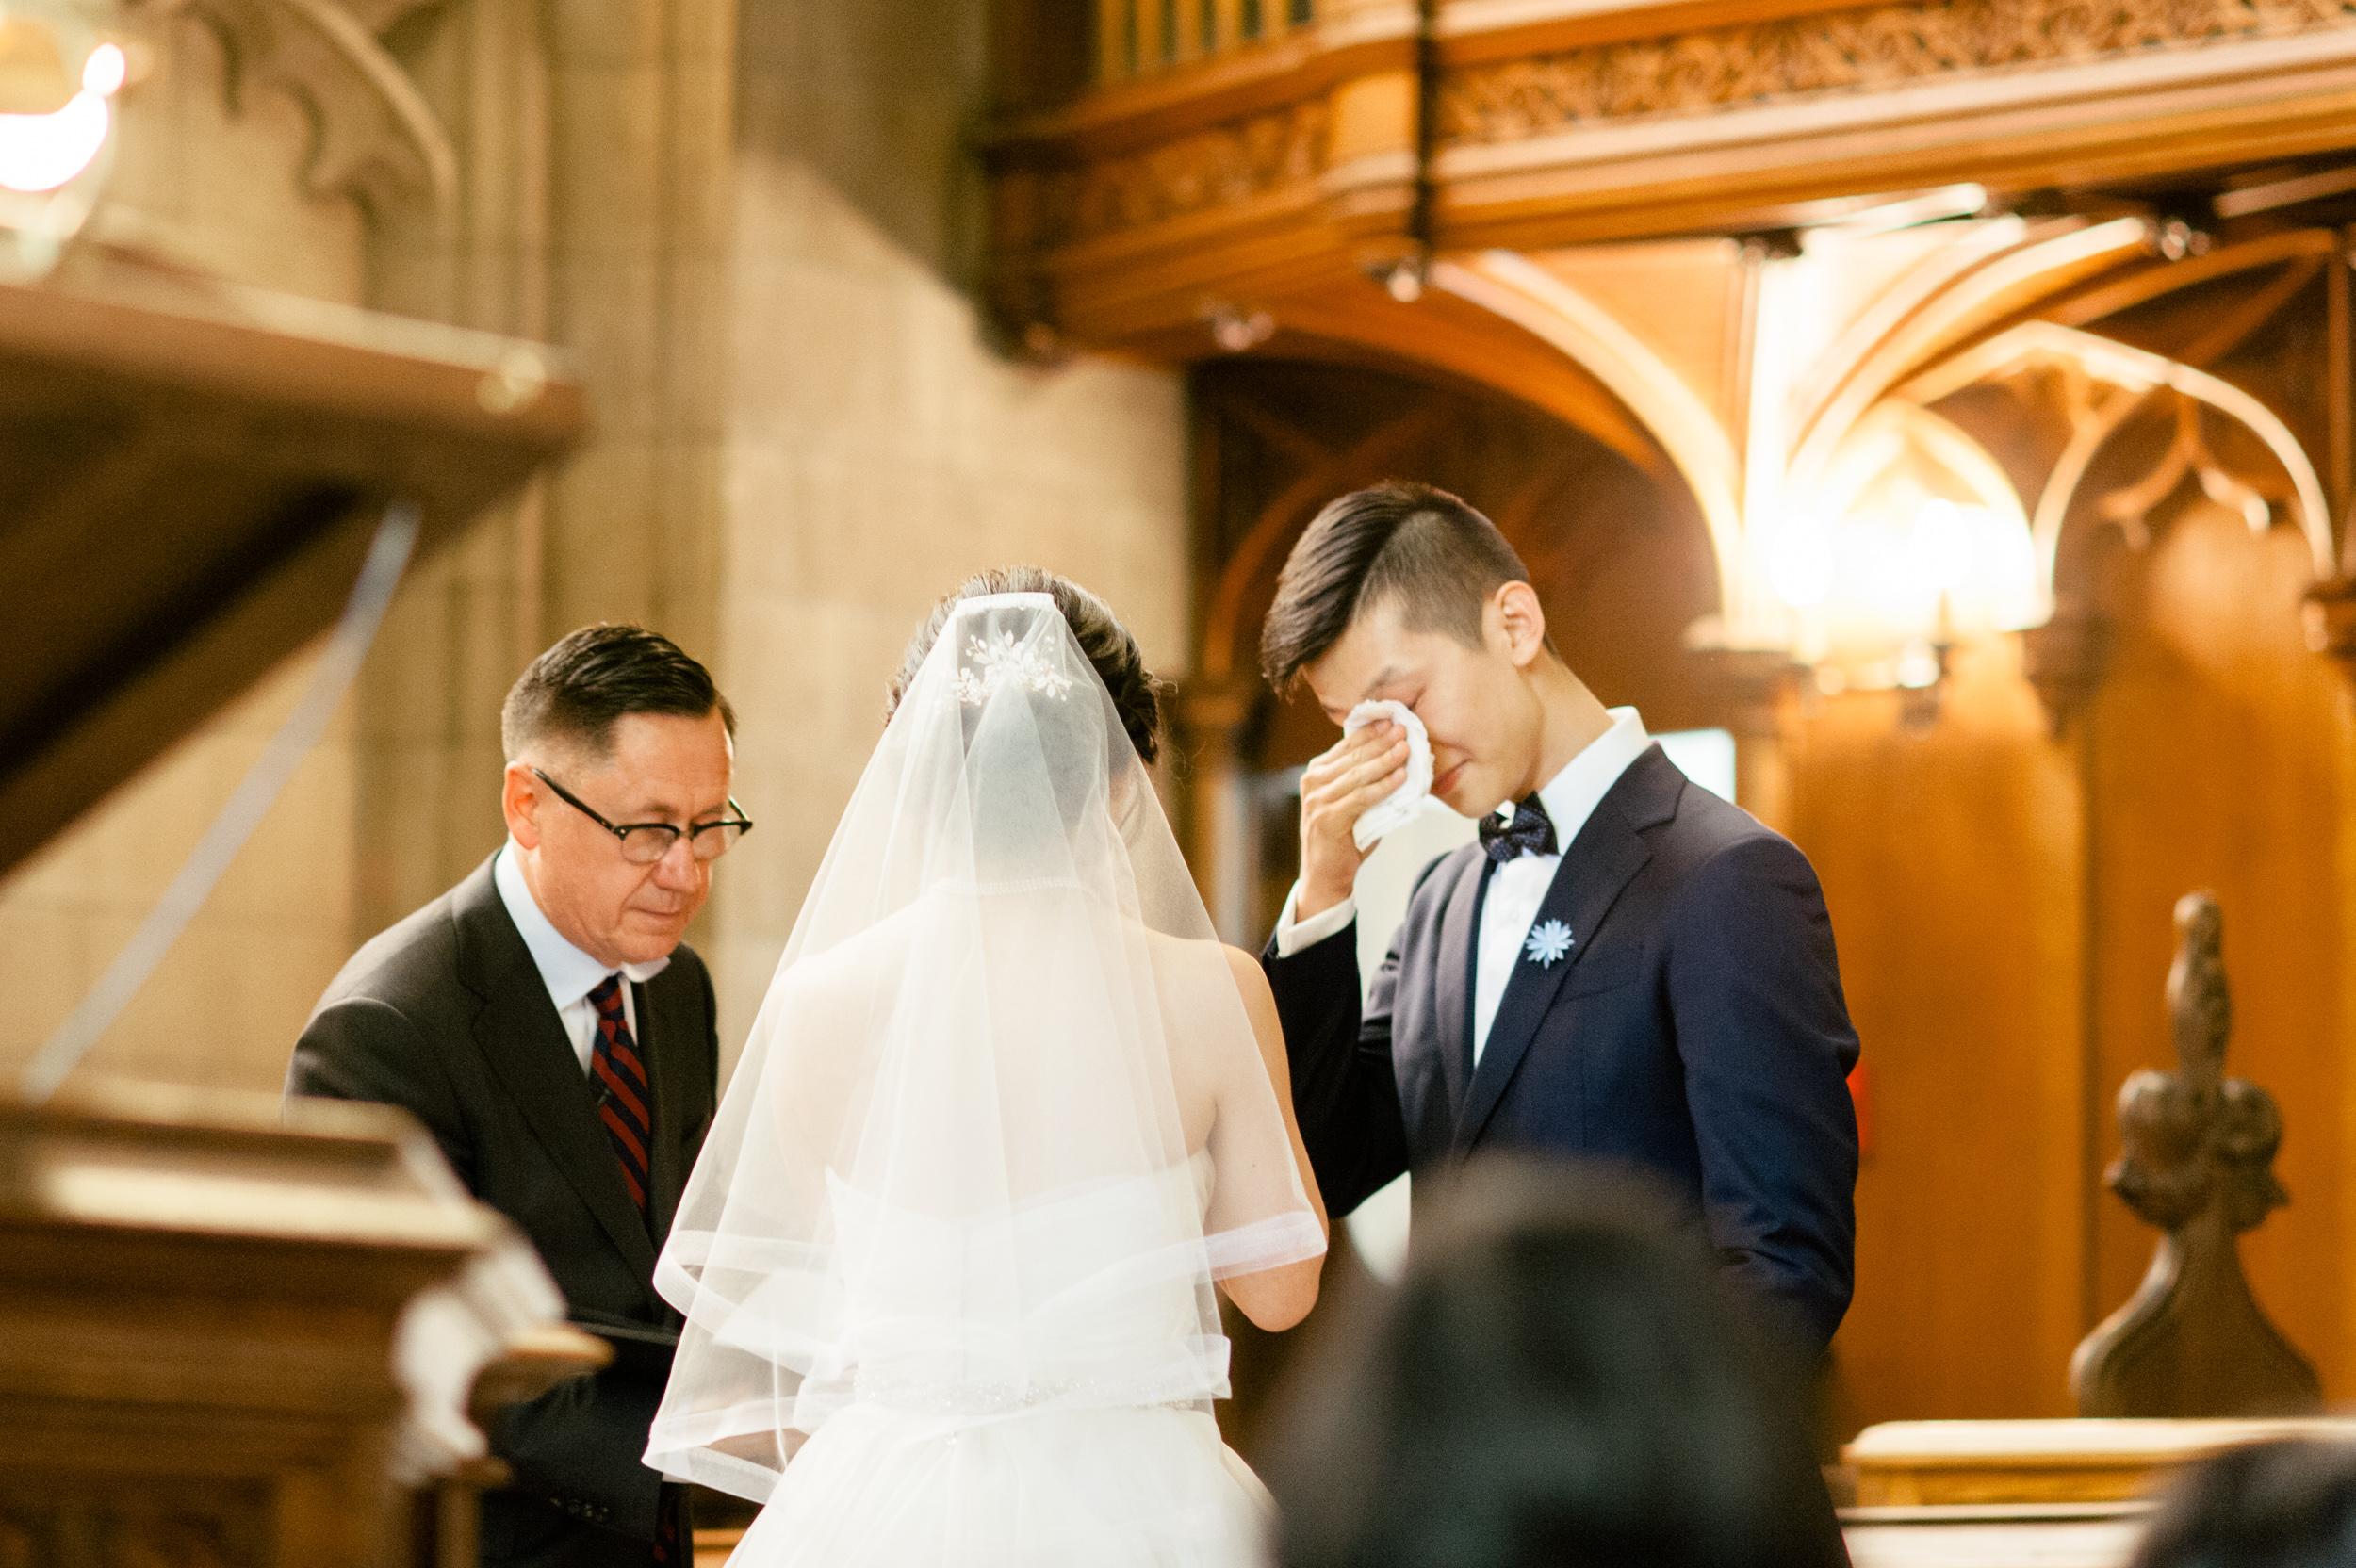 knox-college-wedding-138.jpg